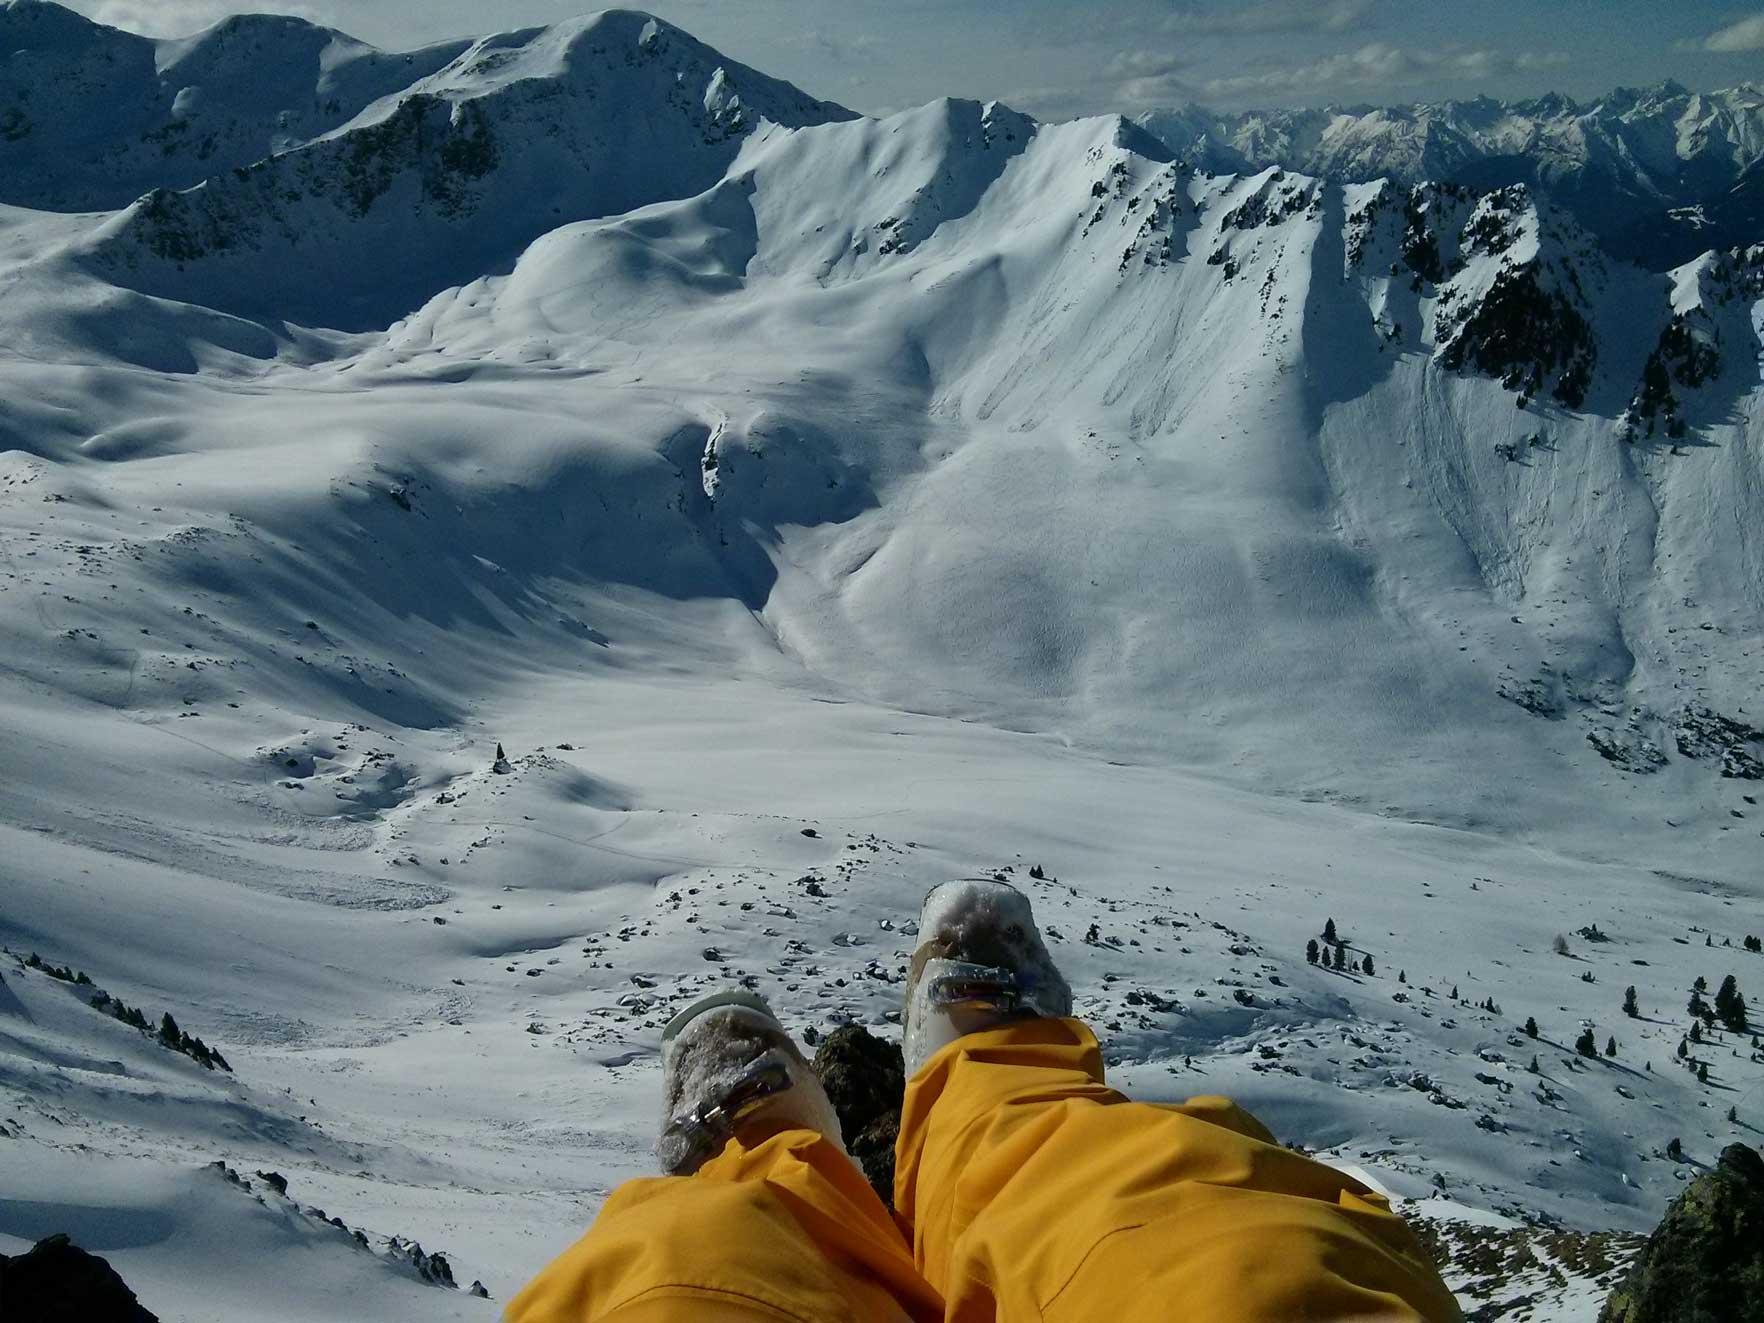 munichmountaingirls-bergblog-frauen-nina-schwind-skitour-gehen-kuehtai-schafzoll